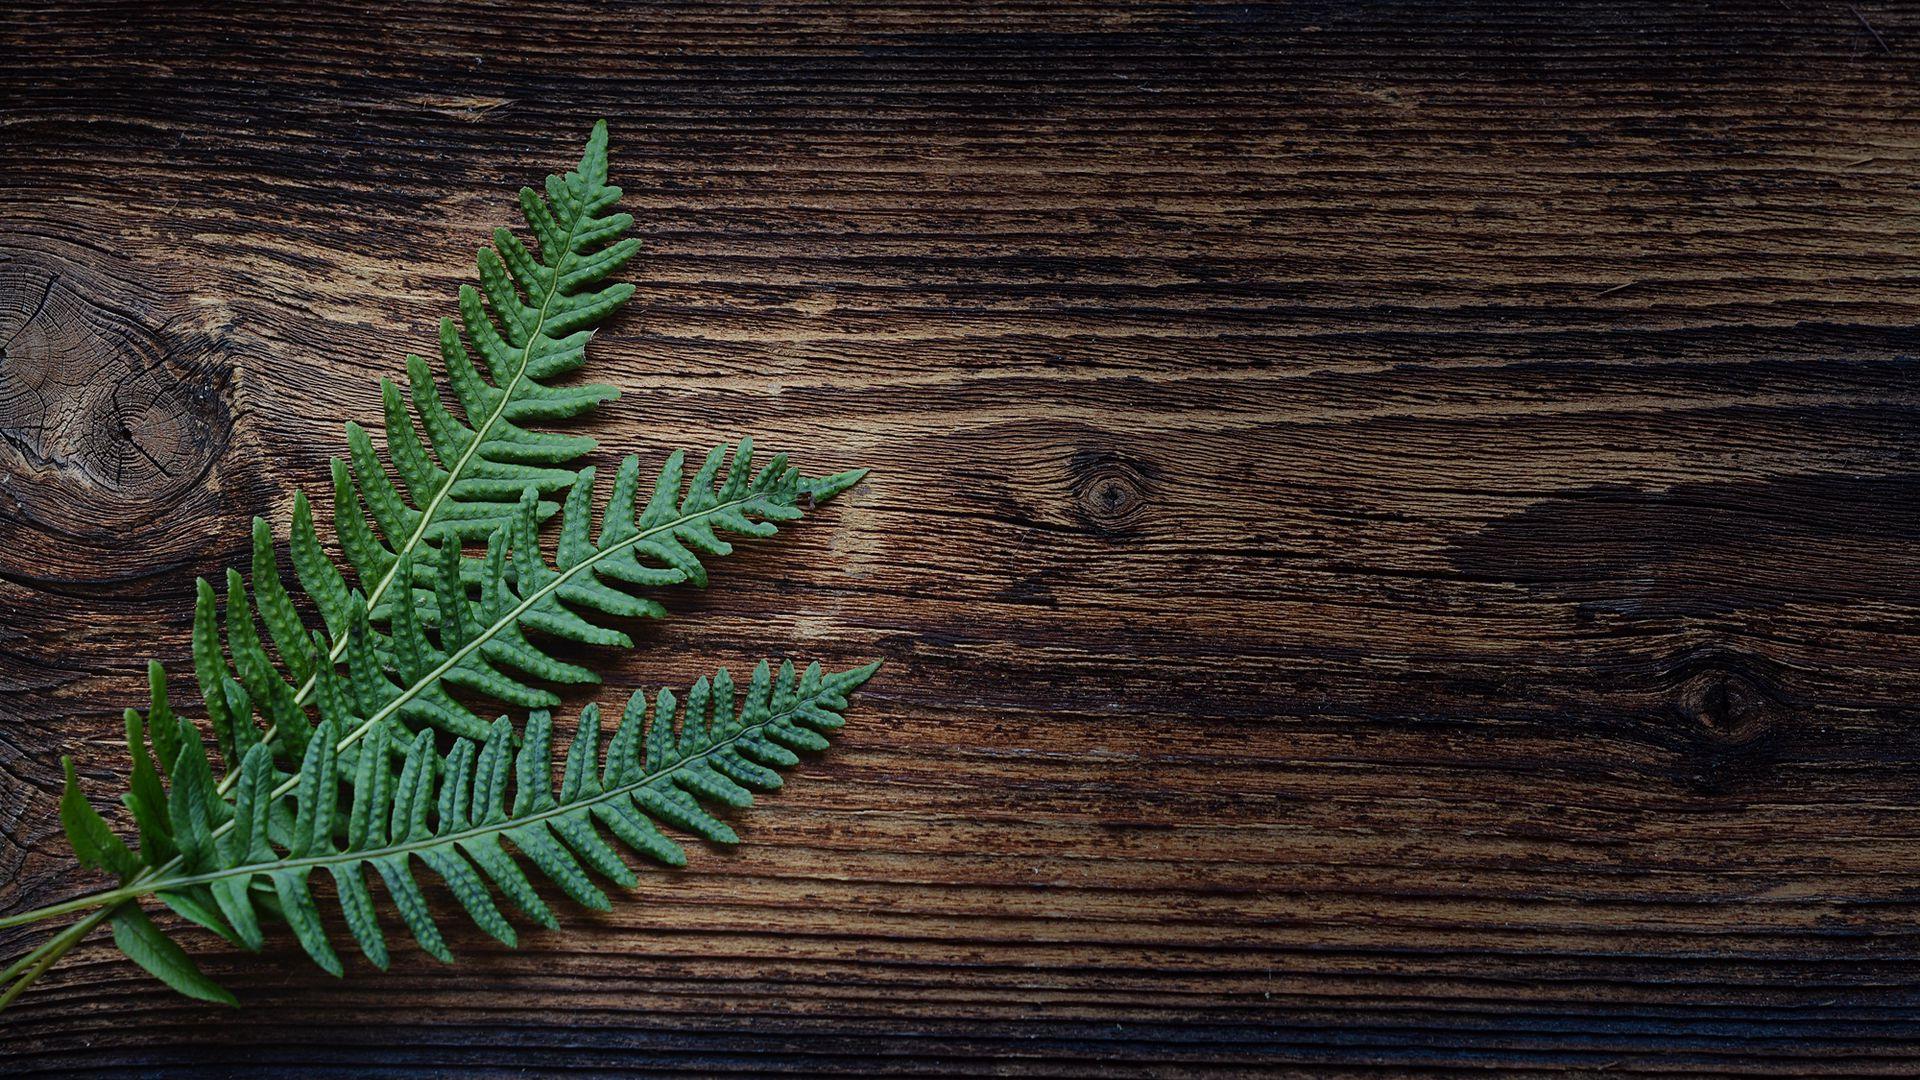 1920x1080 Wallpaper fern, plant, leaves